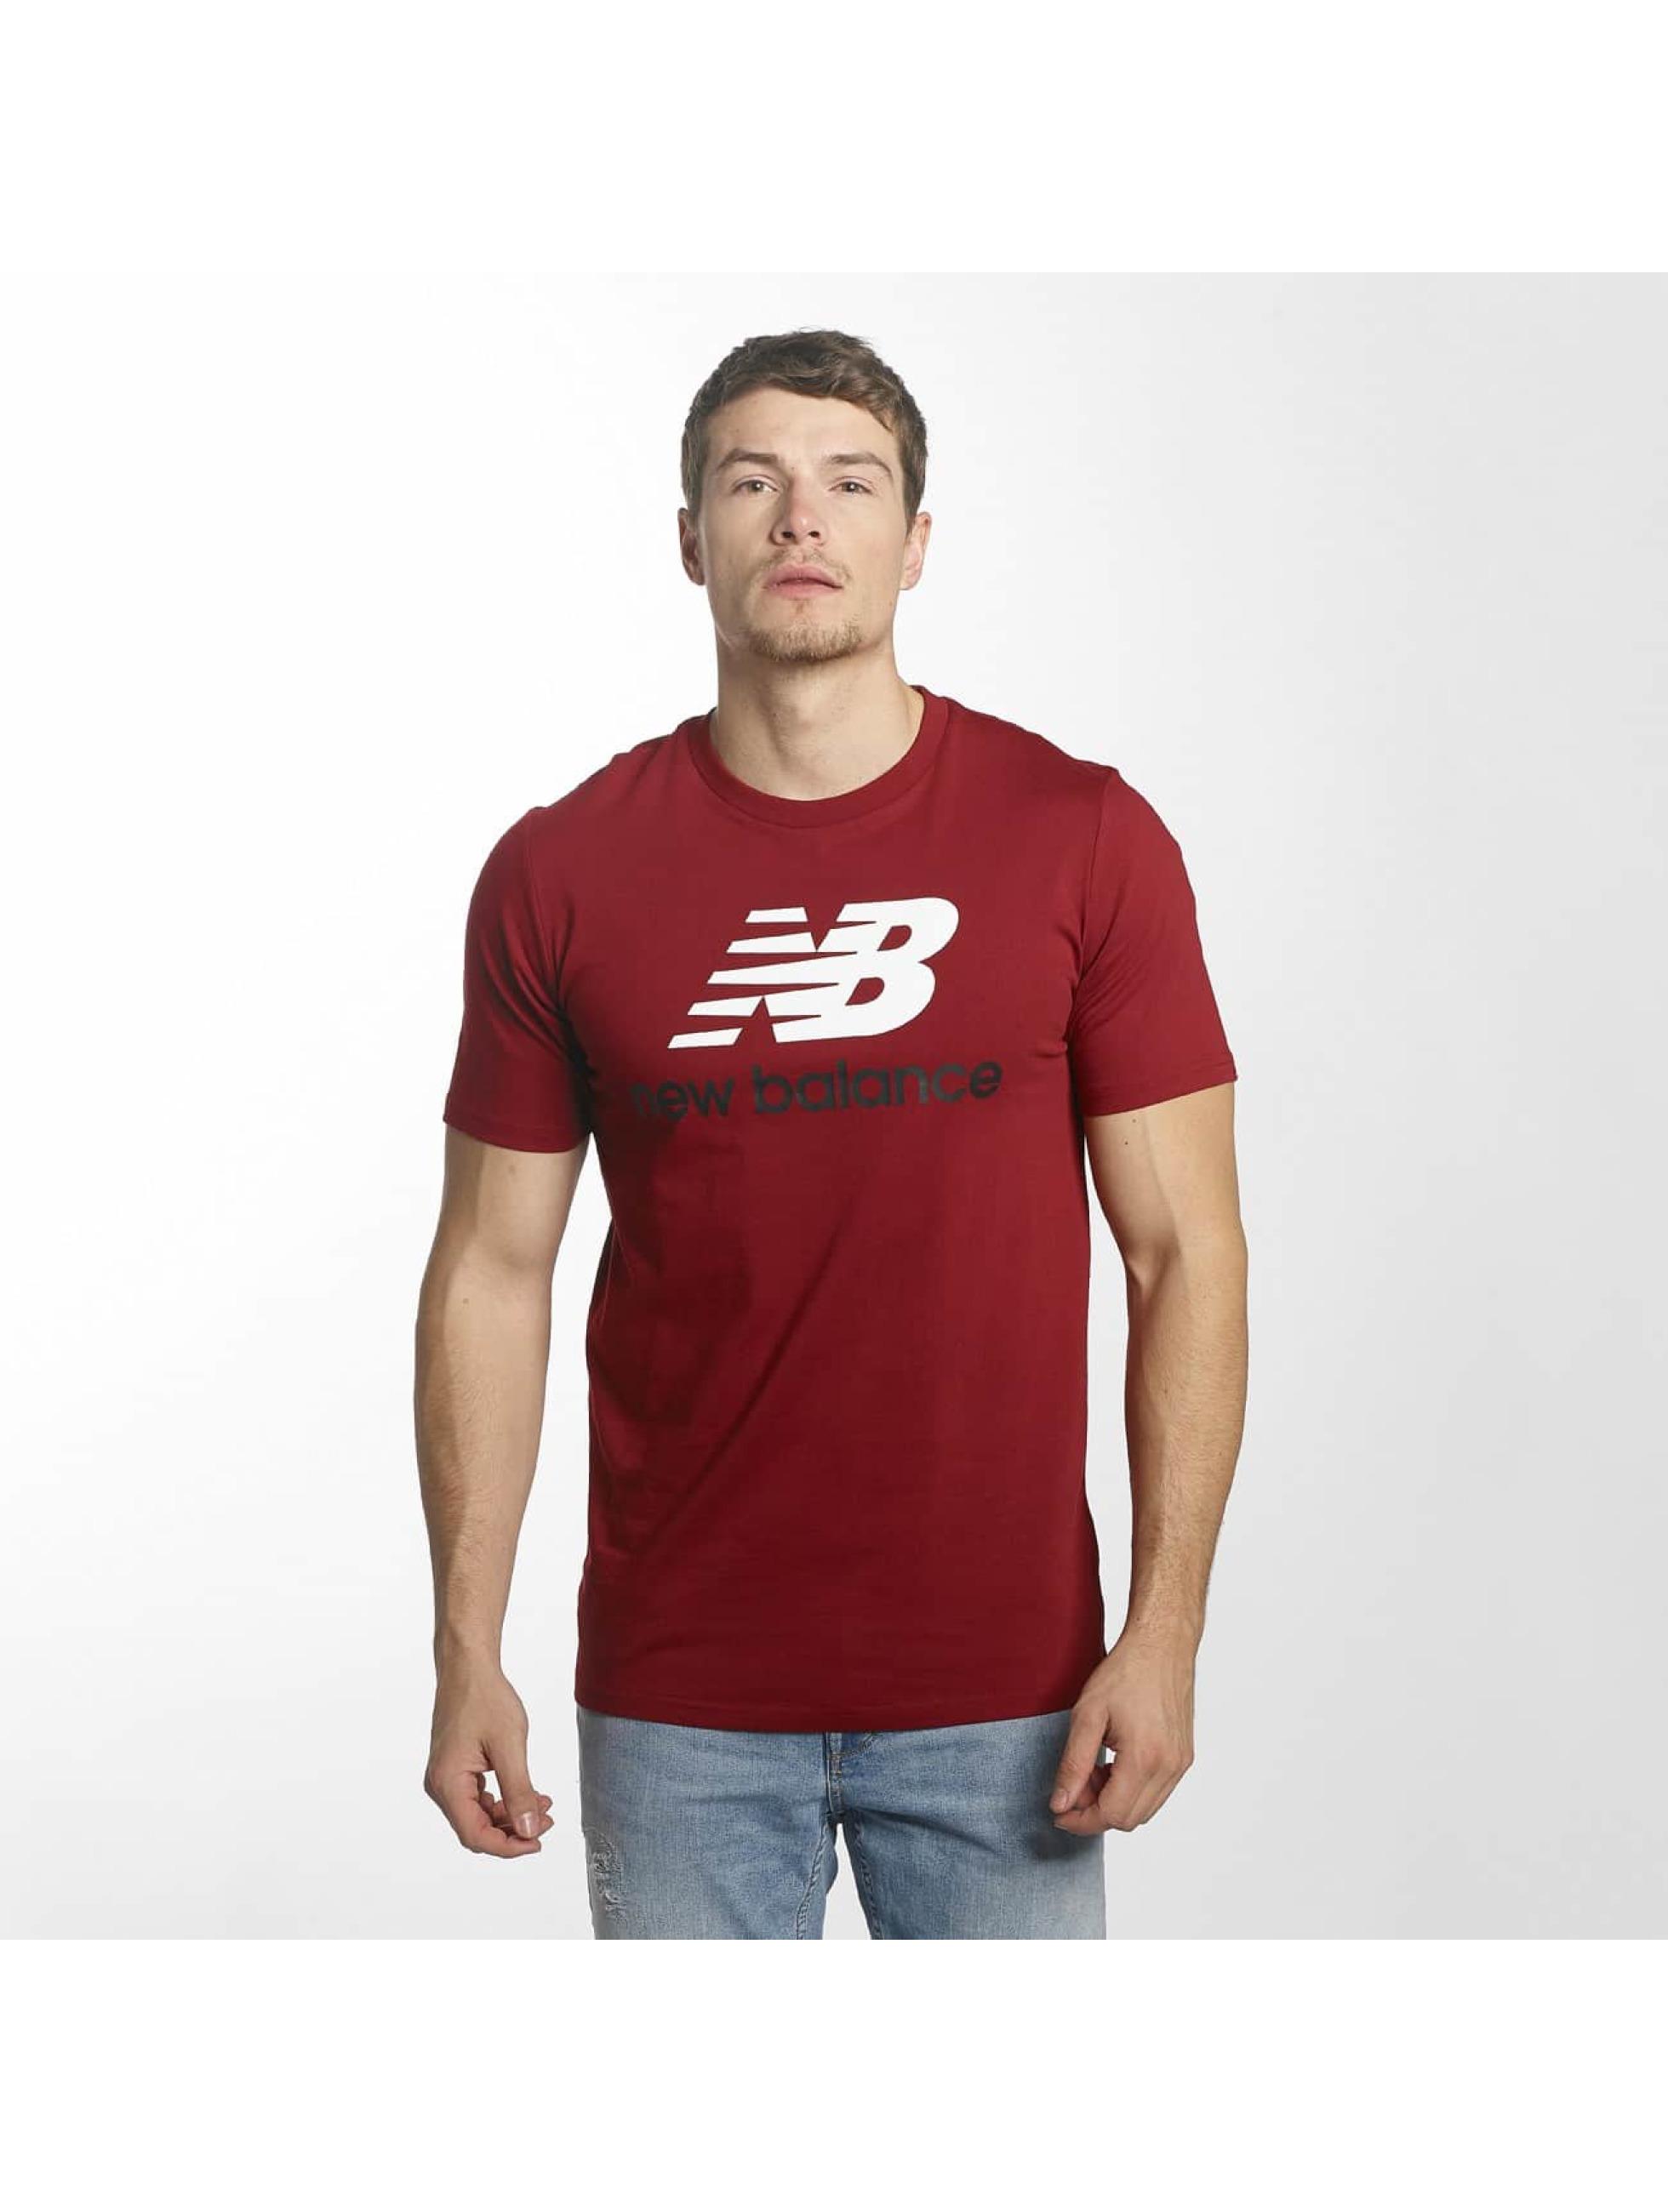 New Balance T-Shirt MT73587 Essentials red